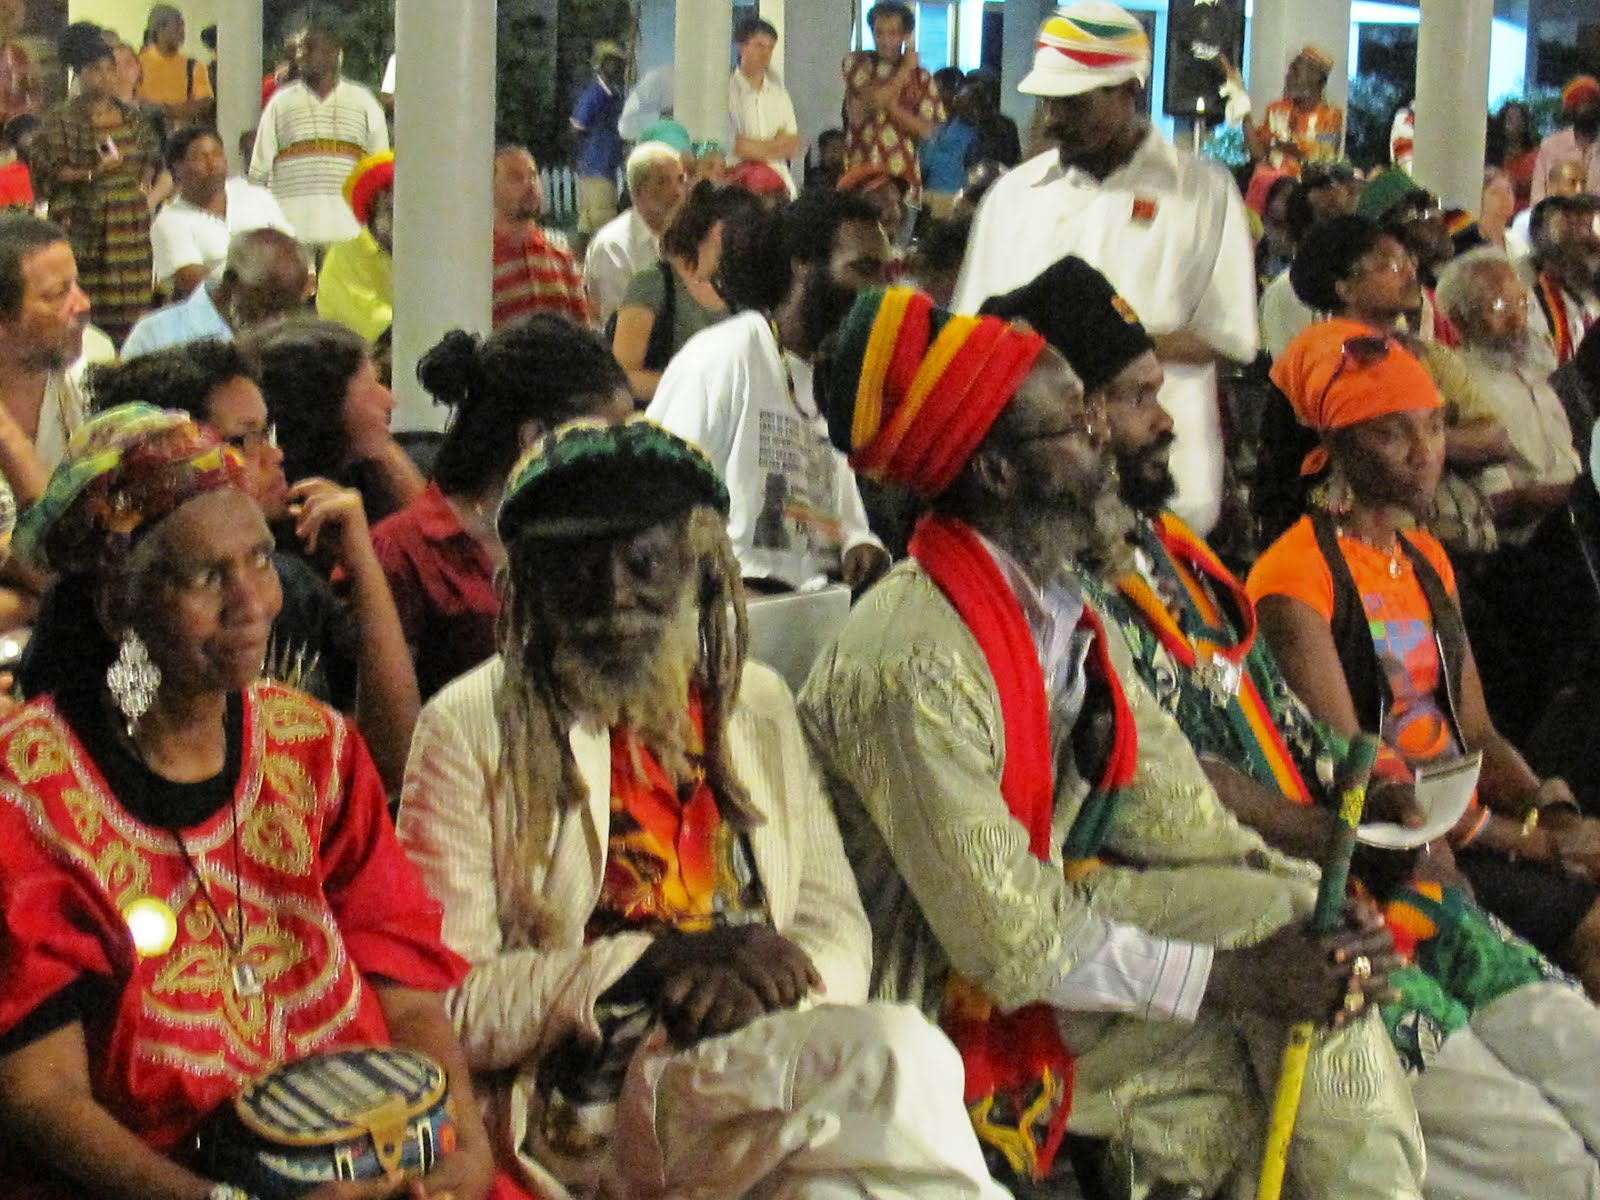 The semaj mind spa the future of rastafari the future of rastafari biocorpaavc Image collections